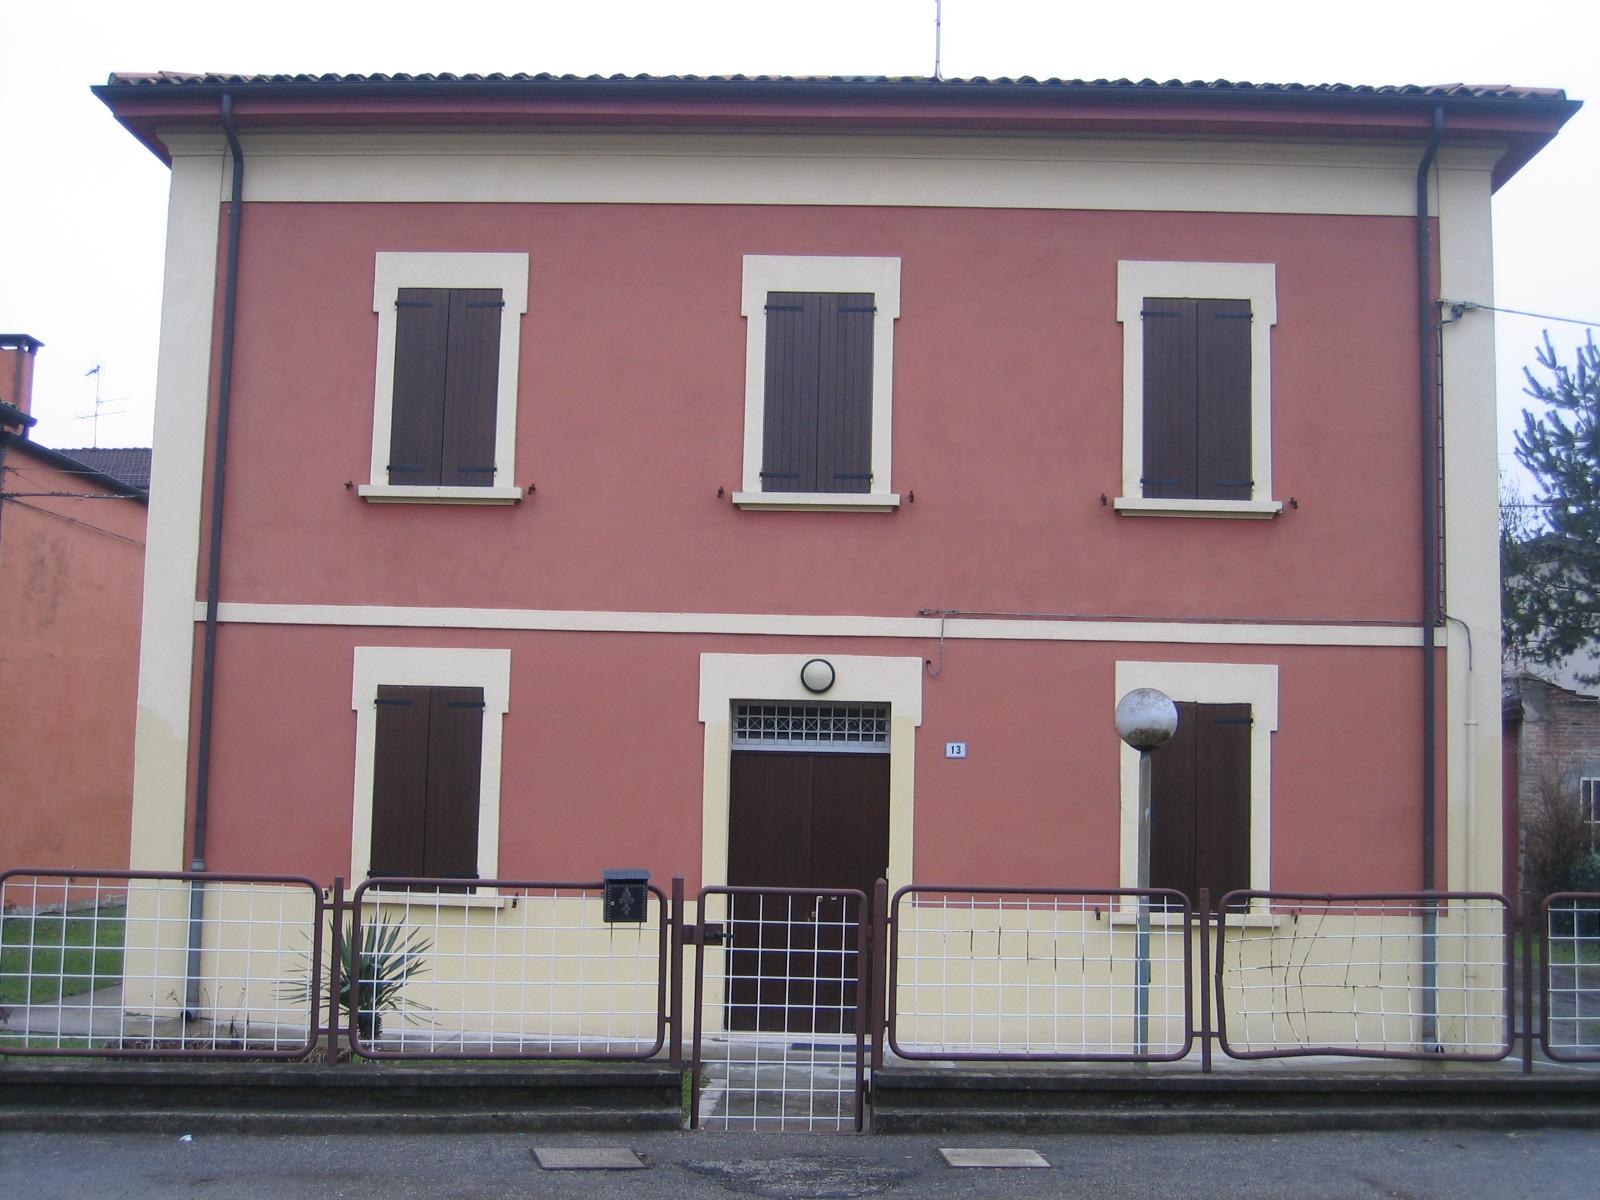 Casa Cantoniera Pieve di cento